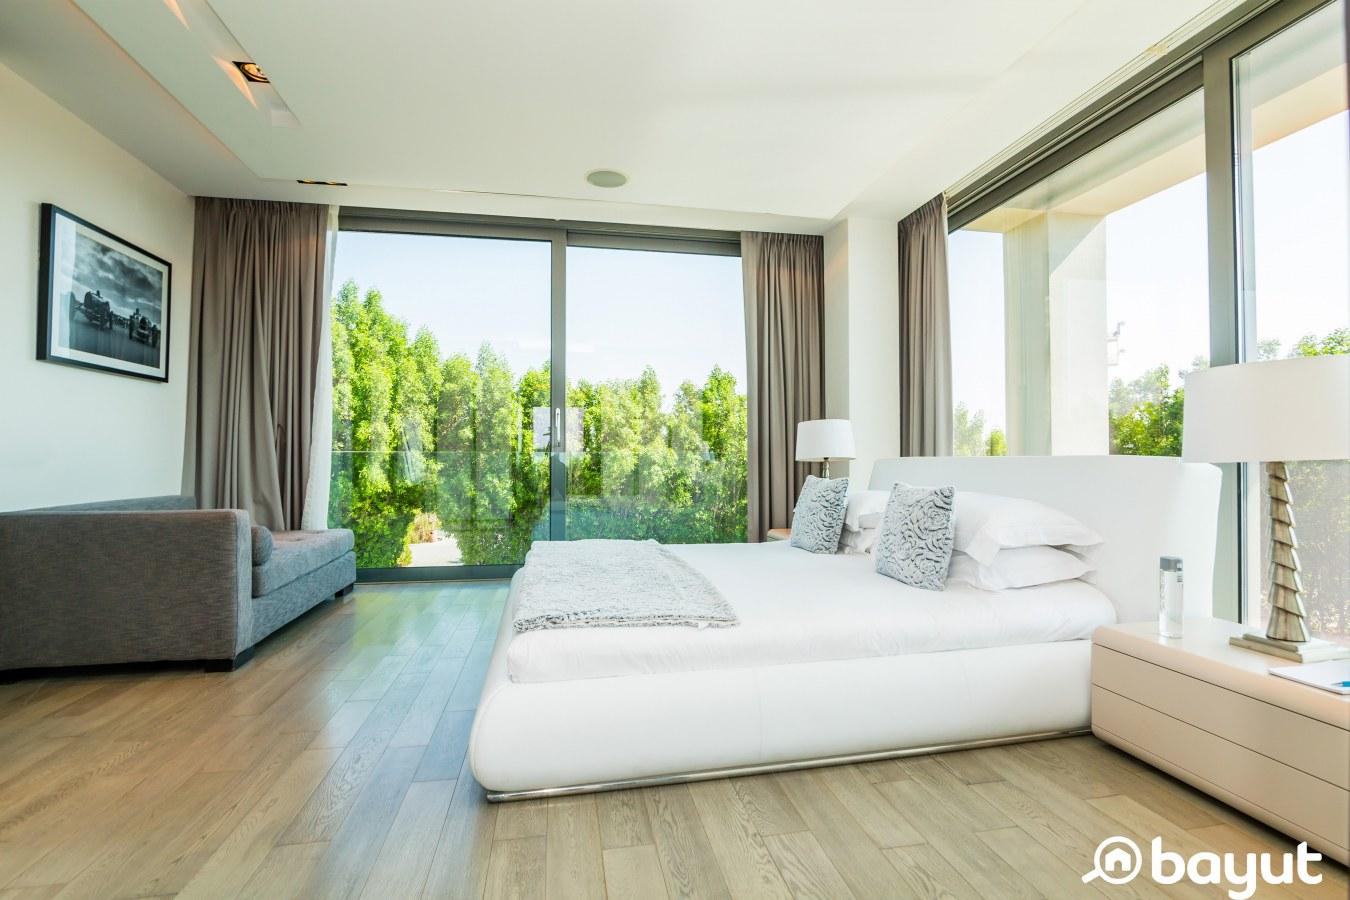 bedroom with views of nature in Nurai Island Abu Dhabi